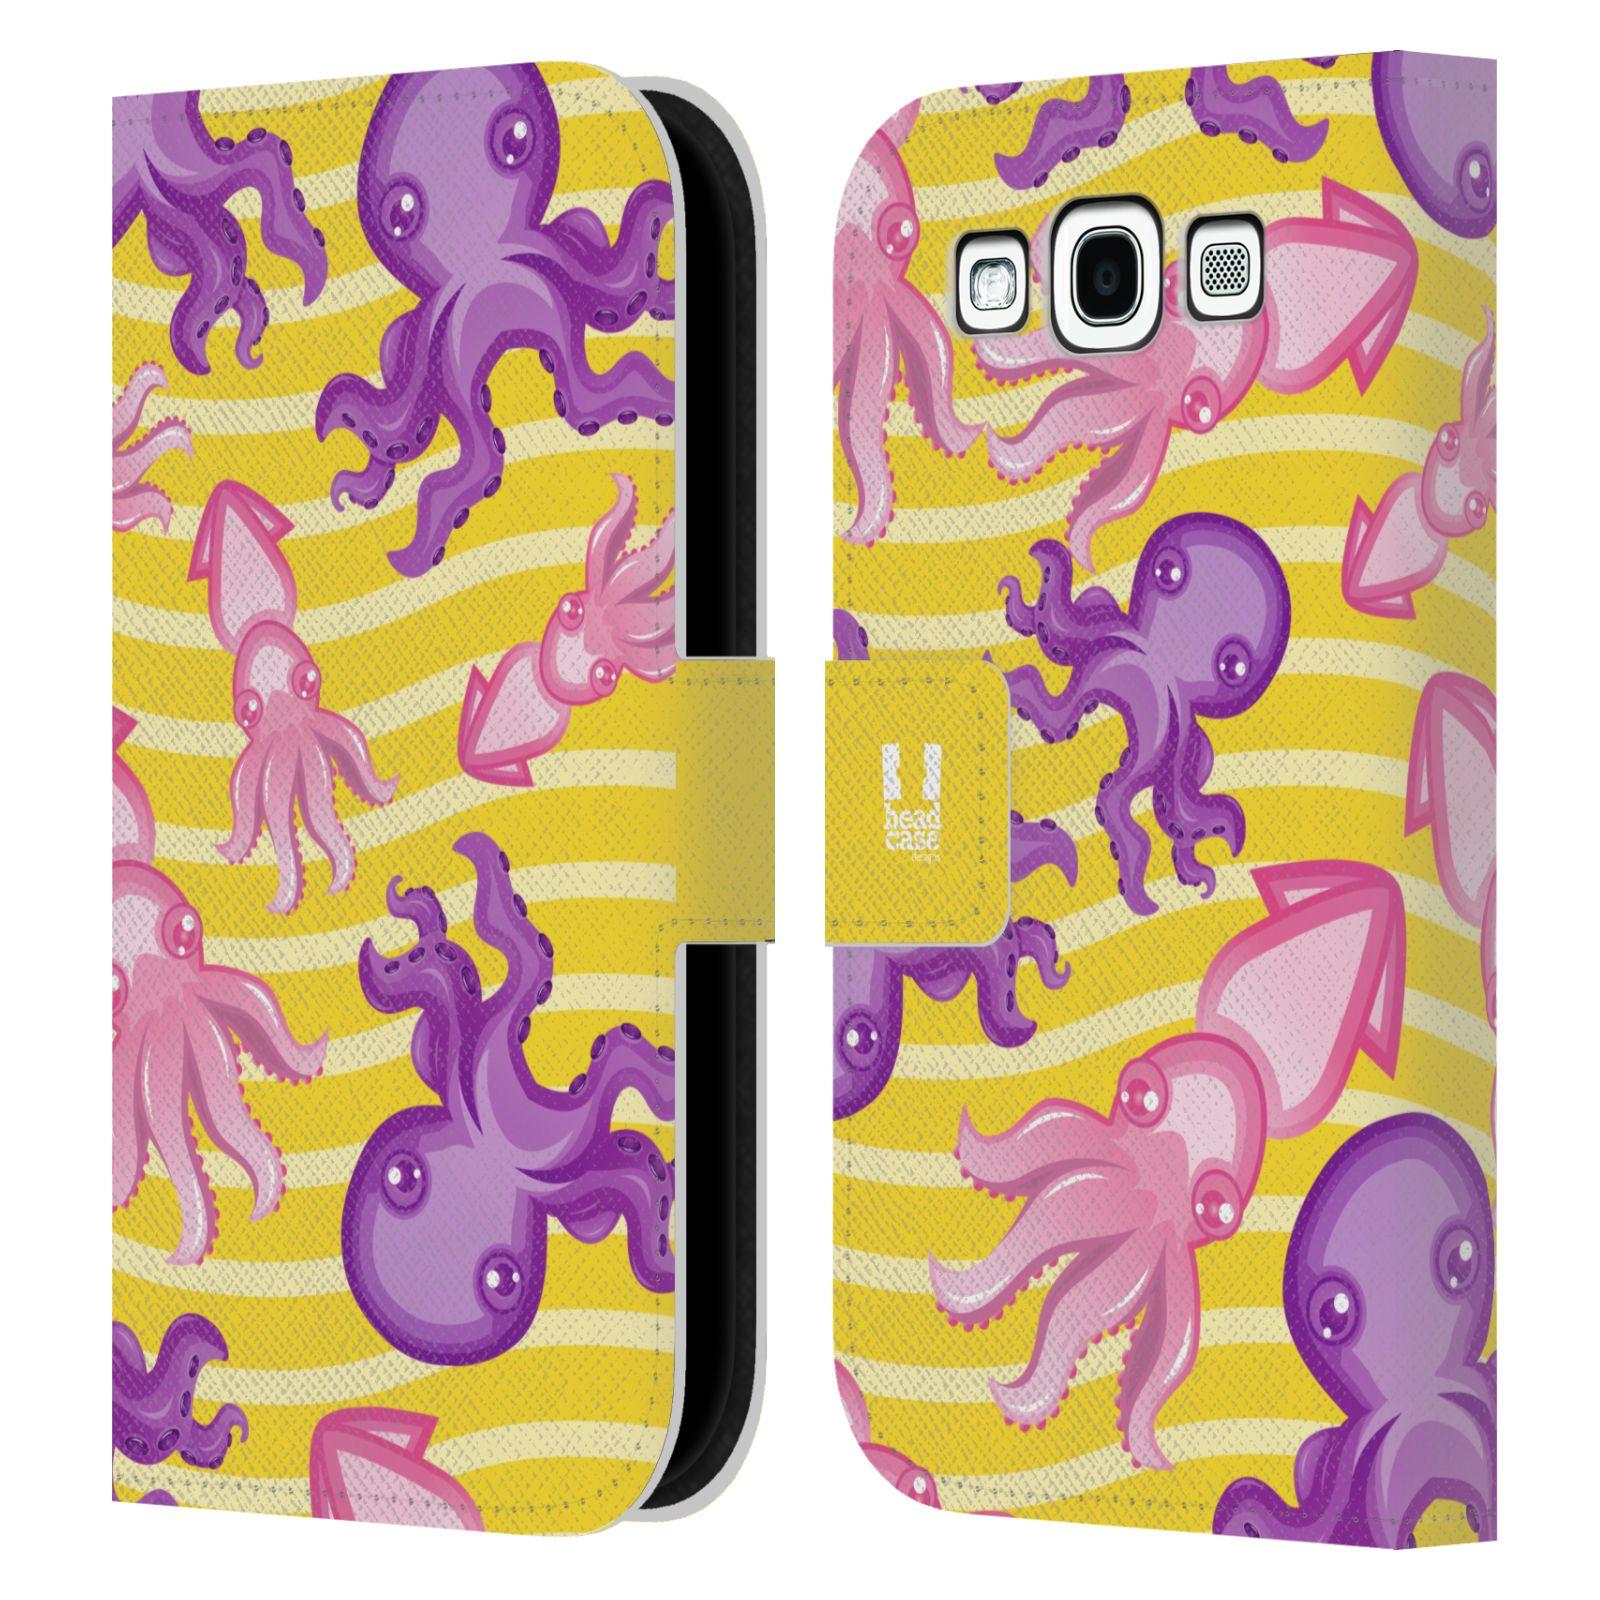 HEAD CASE Flipové pouzdro pro mobil Samsung Galaxy S3 Mořský živočich chobotnice a krakatice žlutá barva